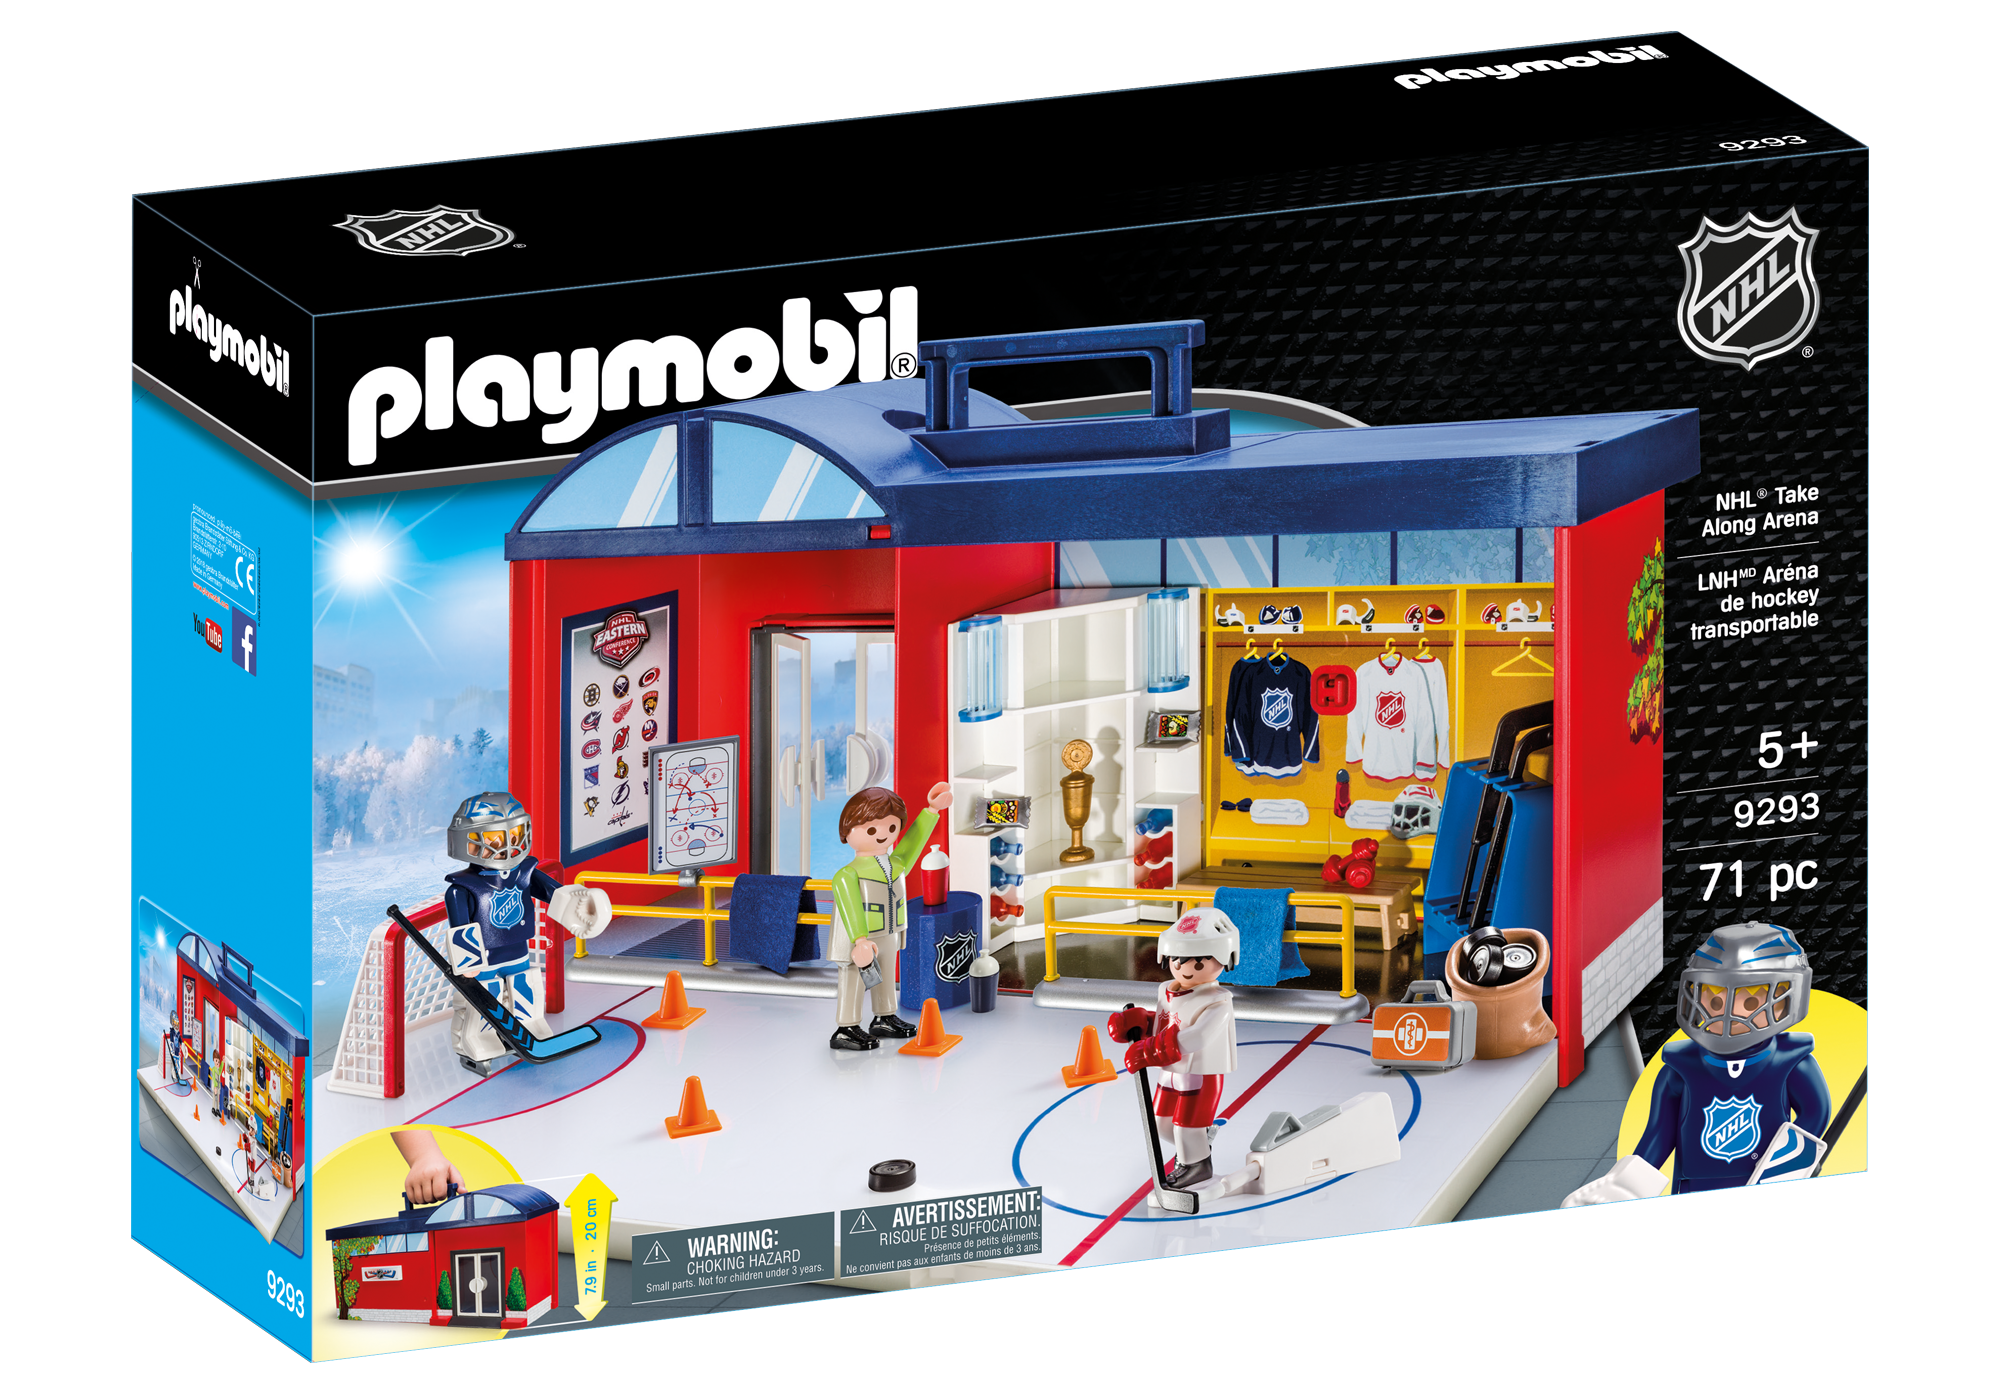 http://media.playmobil.com/i/playmobil/9293_product_box_front/NHL™ Take Along Arena